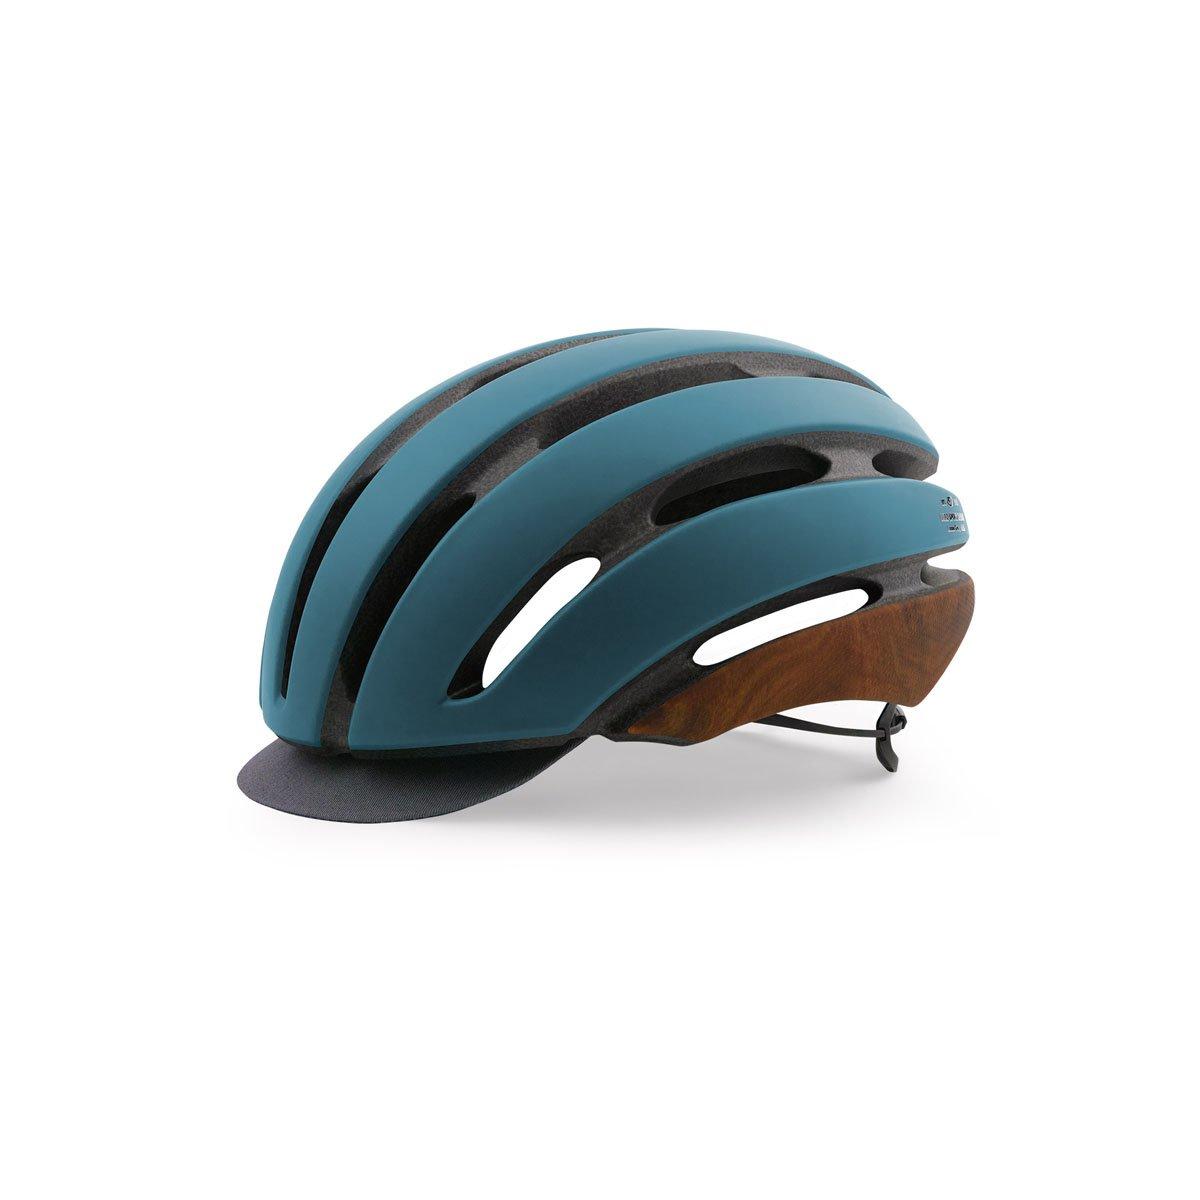 GIRO(ジロ) Aspect Helmet アスペクト サイクリング ヘルメット 【並行輸入品】 S (51-55cm) Matte Storm/Tortoise B075RVX3CT